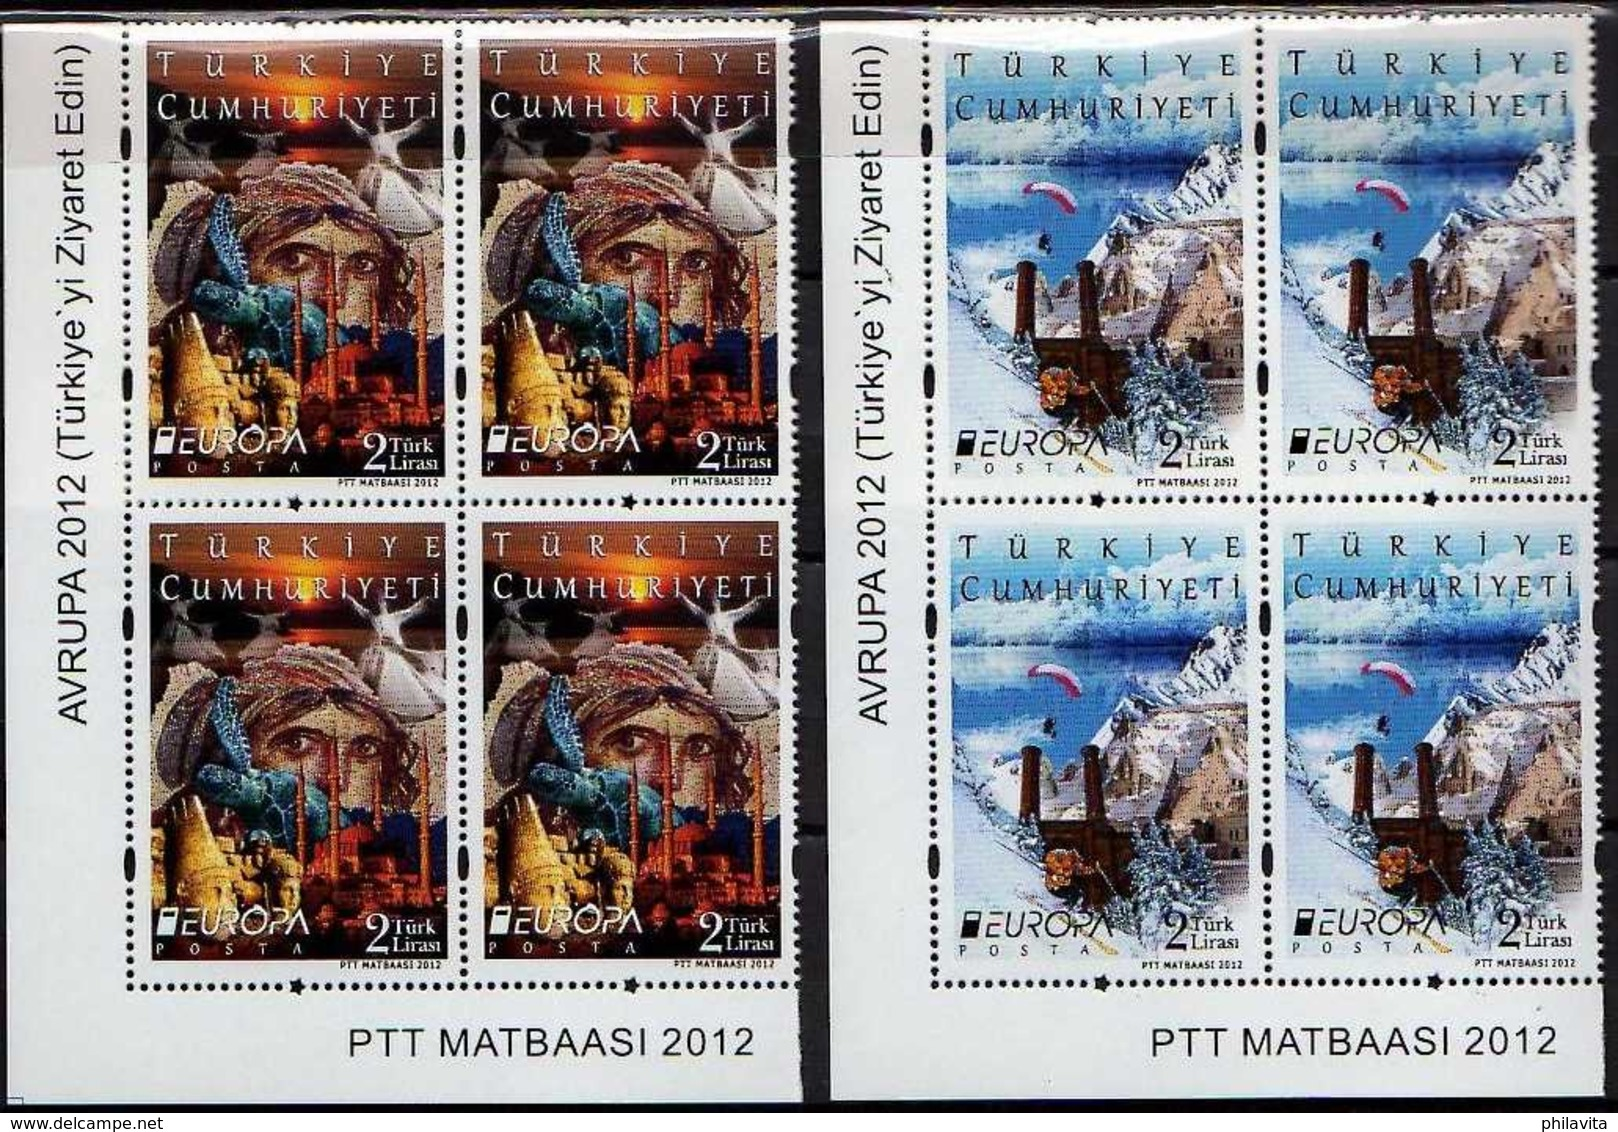 2012 Turkey Europa CEPT Visit -Blocks Of 4 Corners -Mi 3954/3955 -MNH** - Nuevos